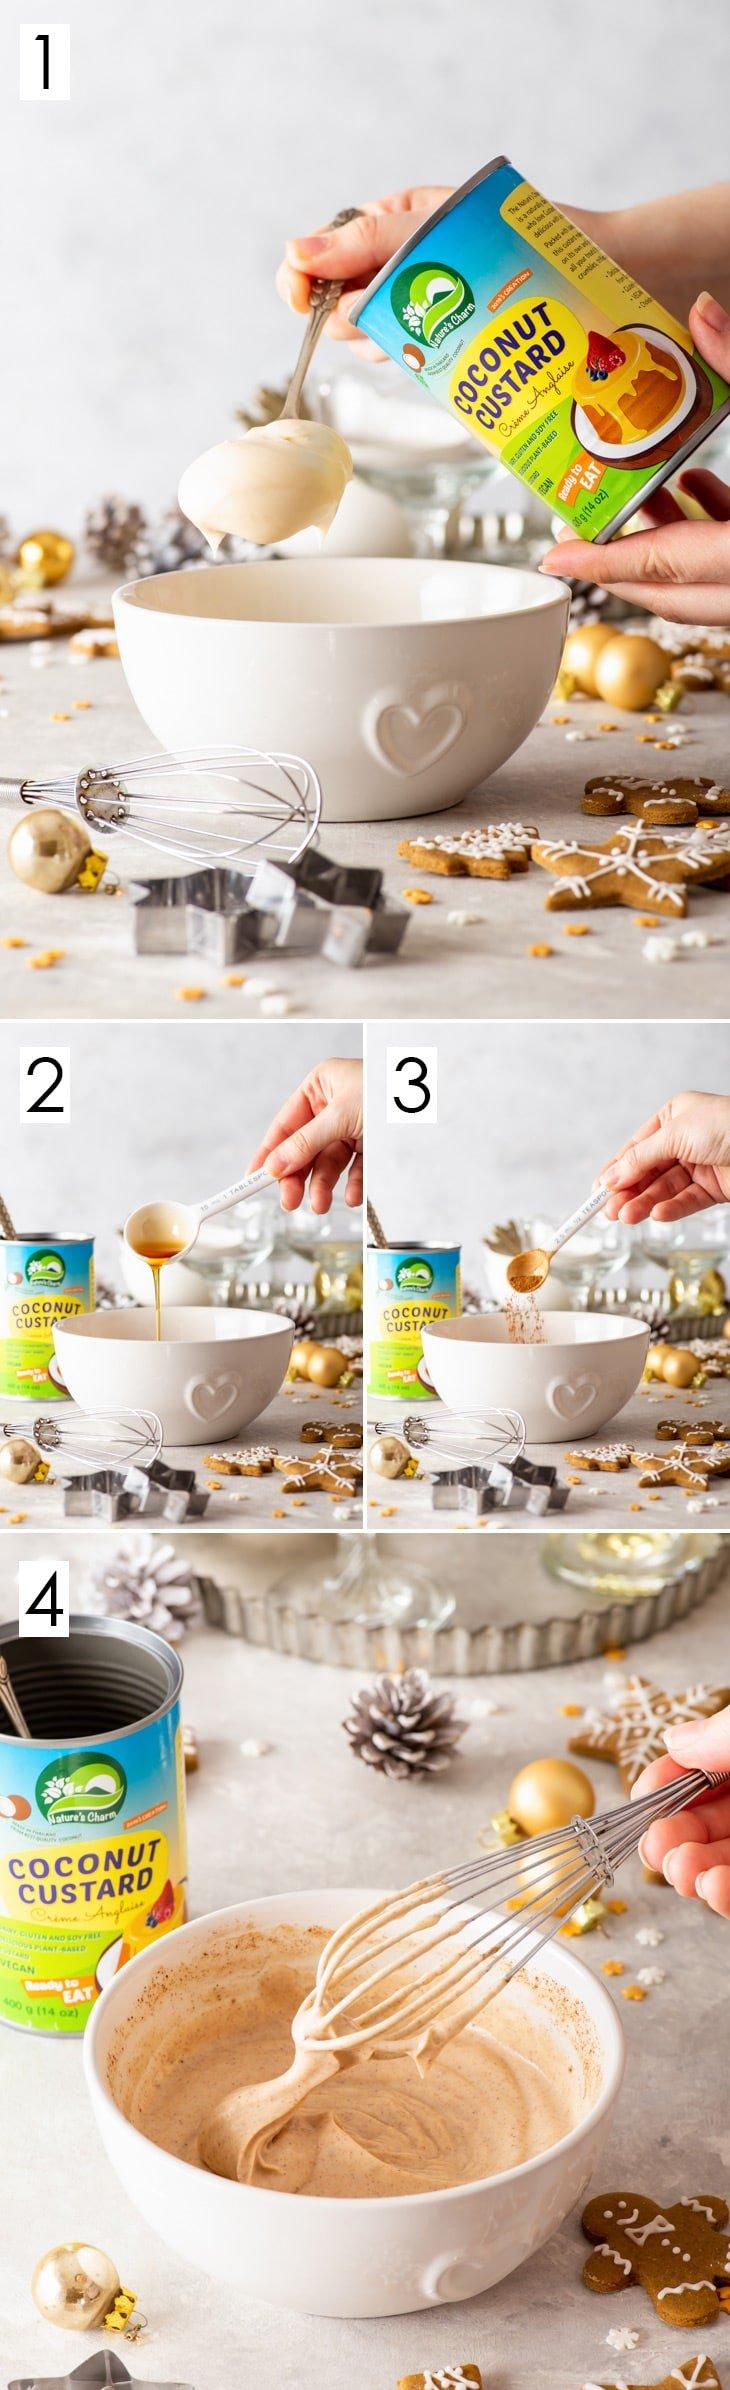 4-step process of making the vegan cinnamon & maple syrup coconut custard.